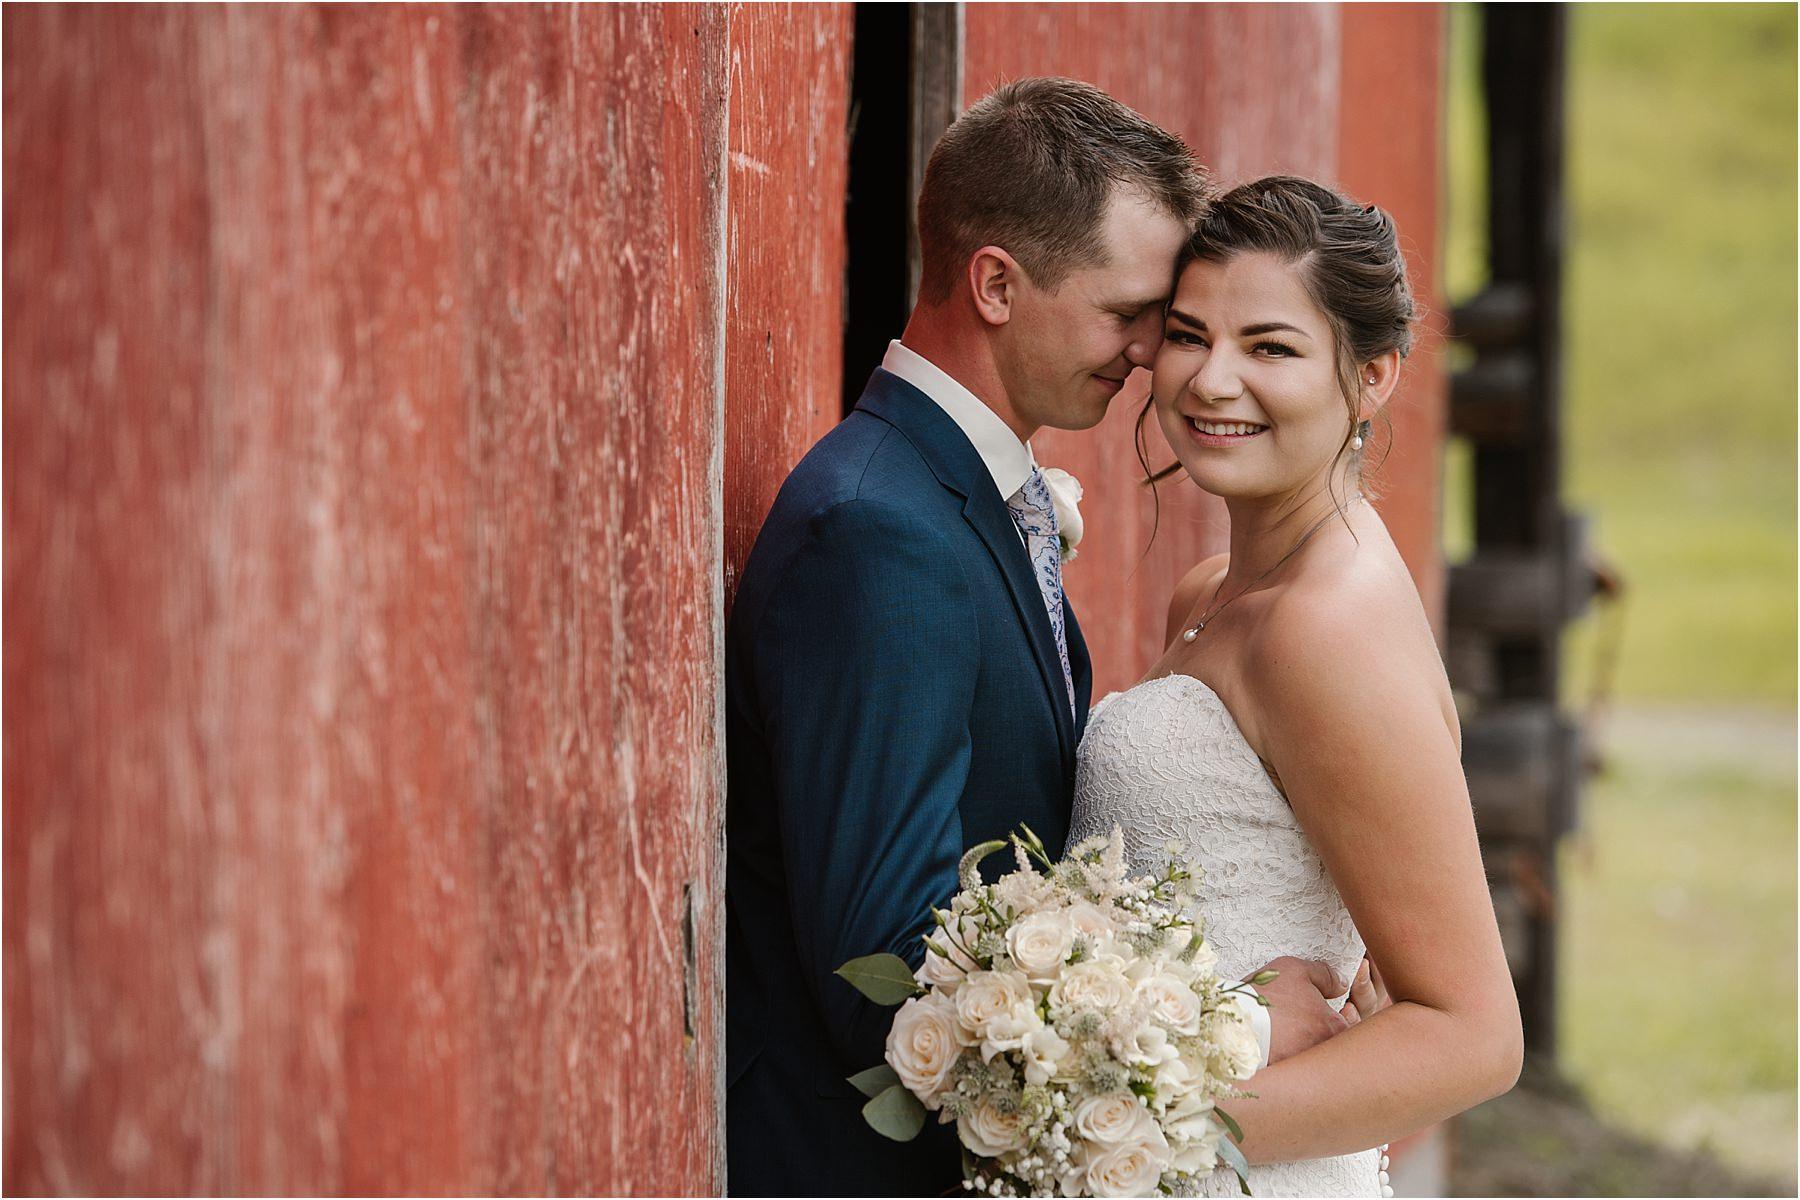 Okanagan country wedding photographer BC Interior bride groom romantic bridal style portraits blue tuxedo